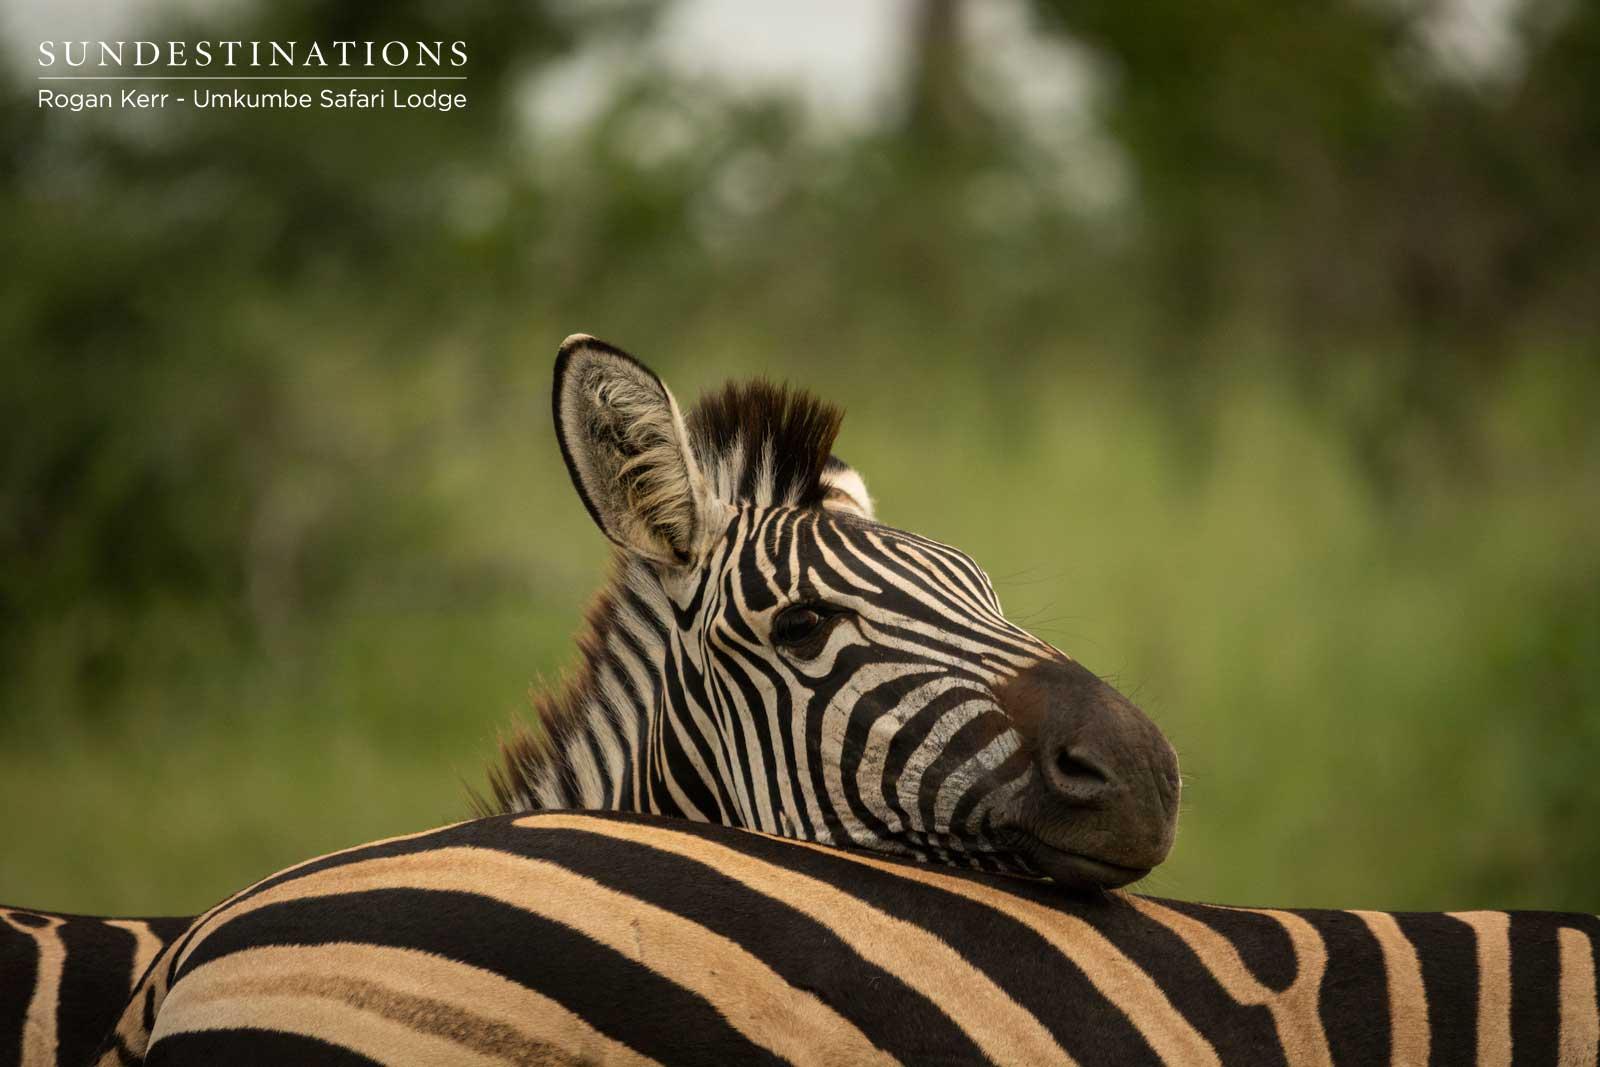 Zebra at Umkmbe Safari Lodge